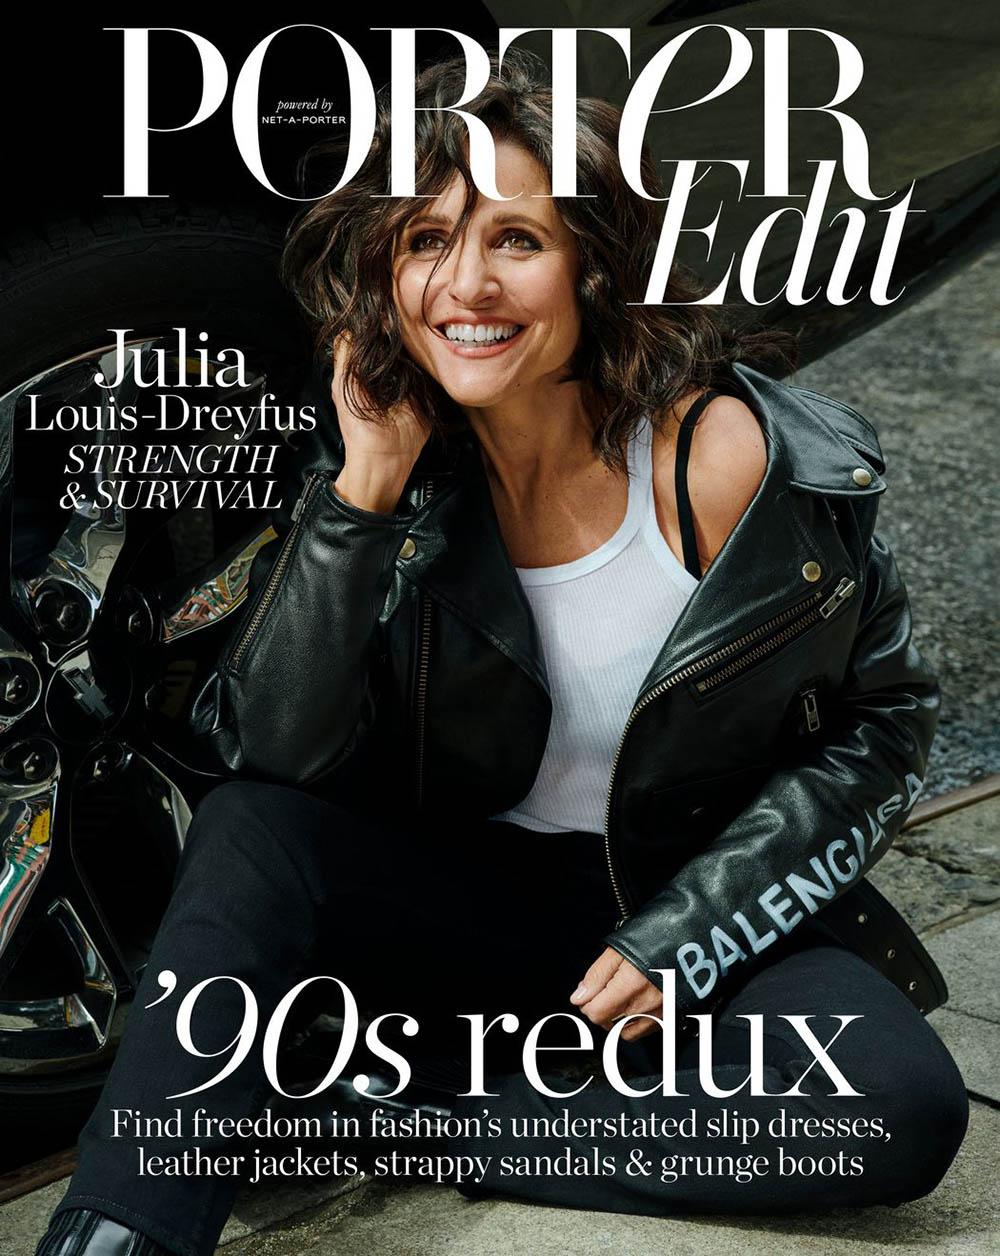 Julia Louis-Dreyfus covers Porter Edit April 19th, 2019 by Tiffany Nicholson